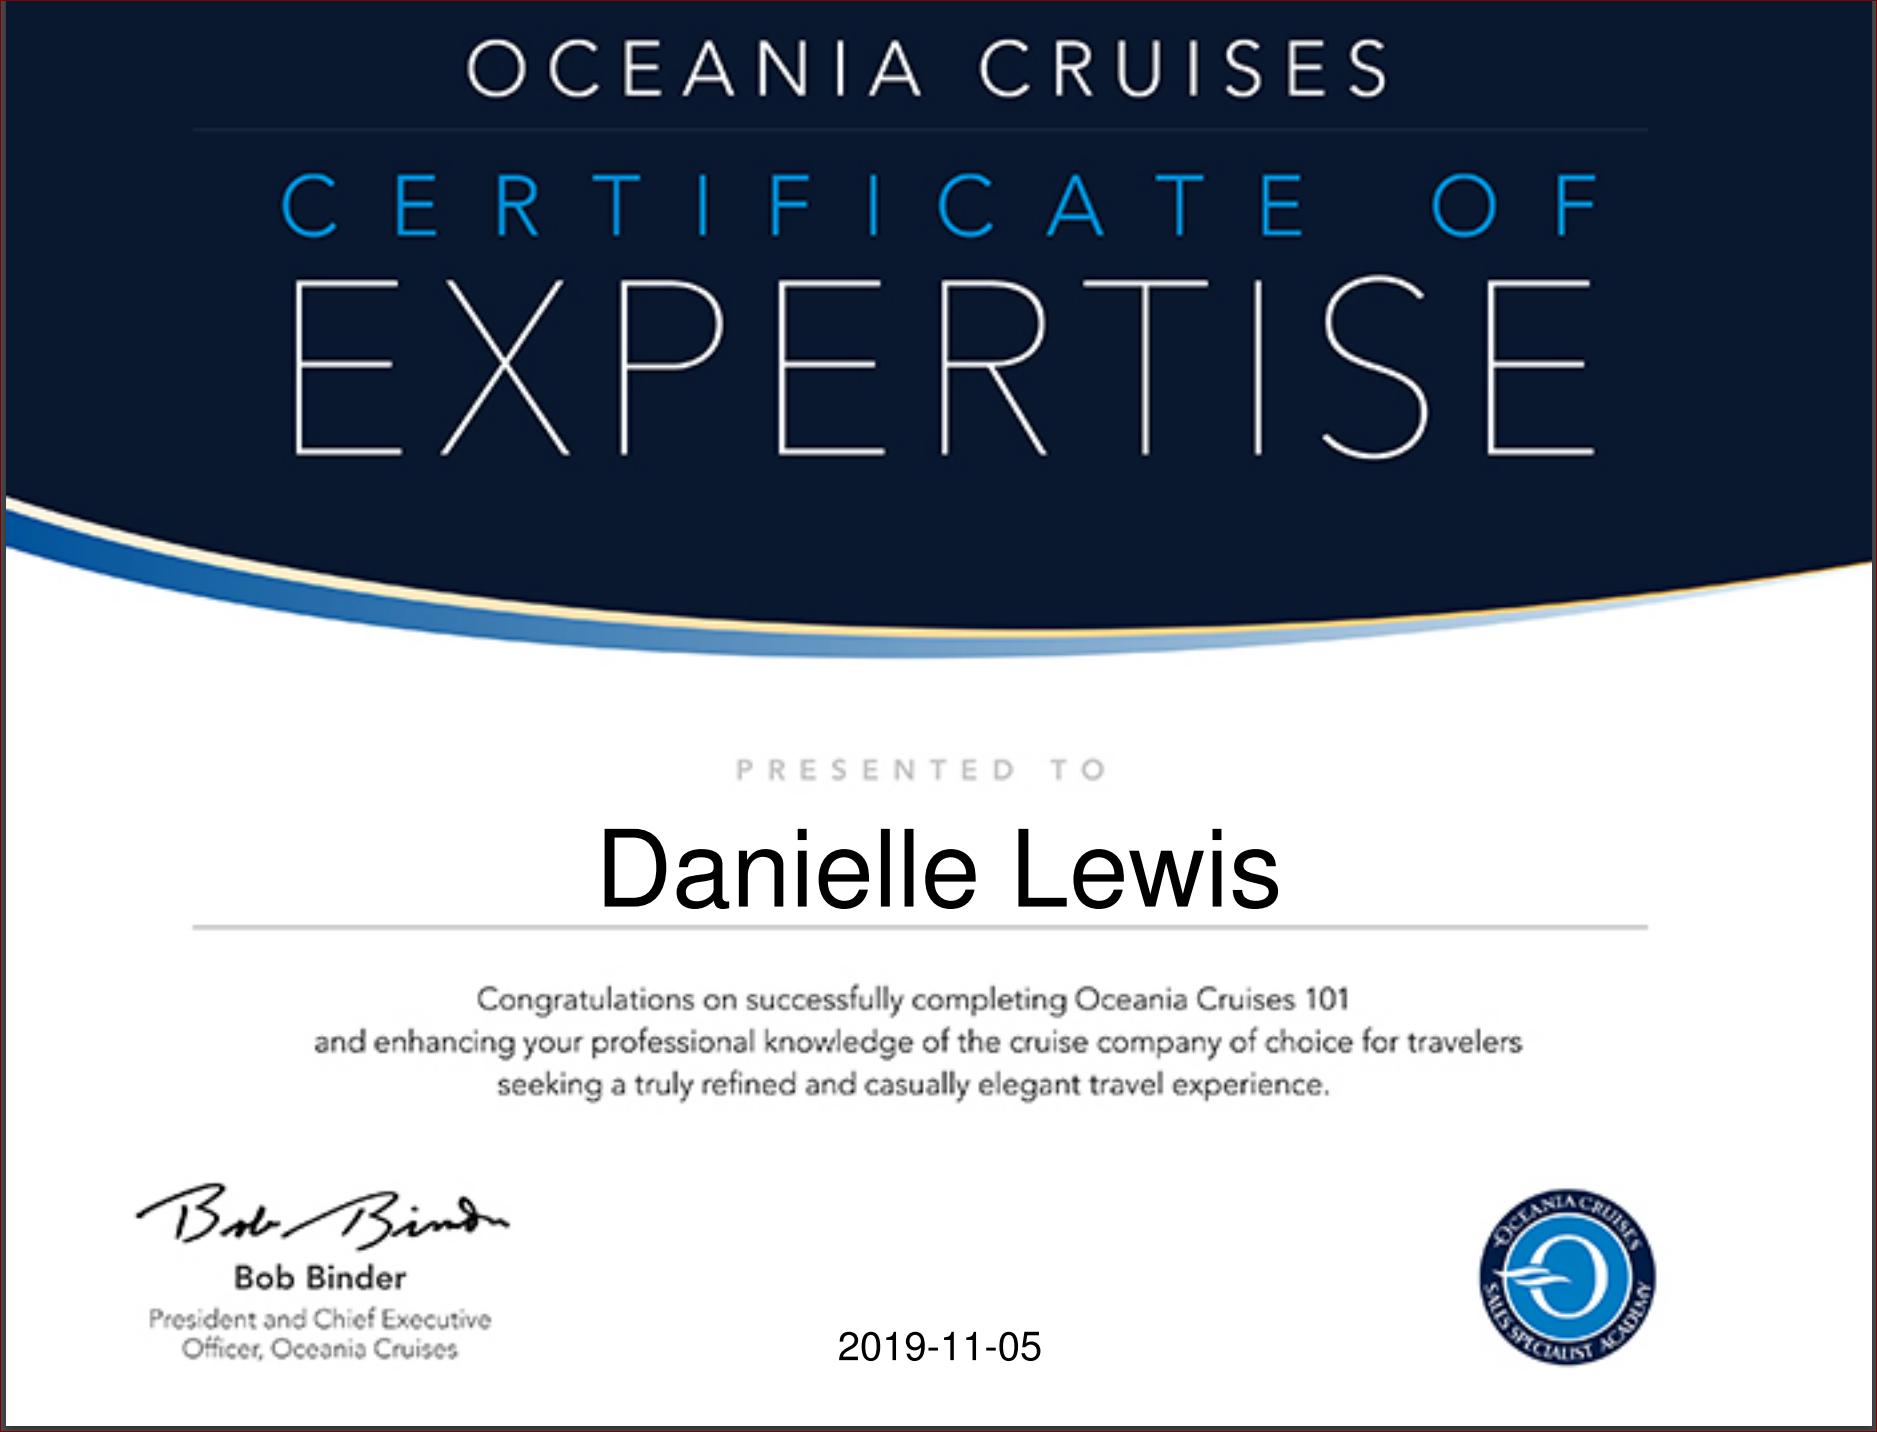 Oceania Cruises - 101 Certificate of Expertise